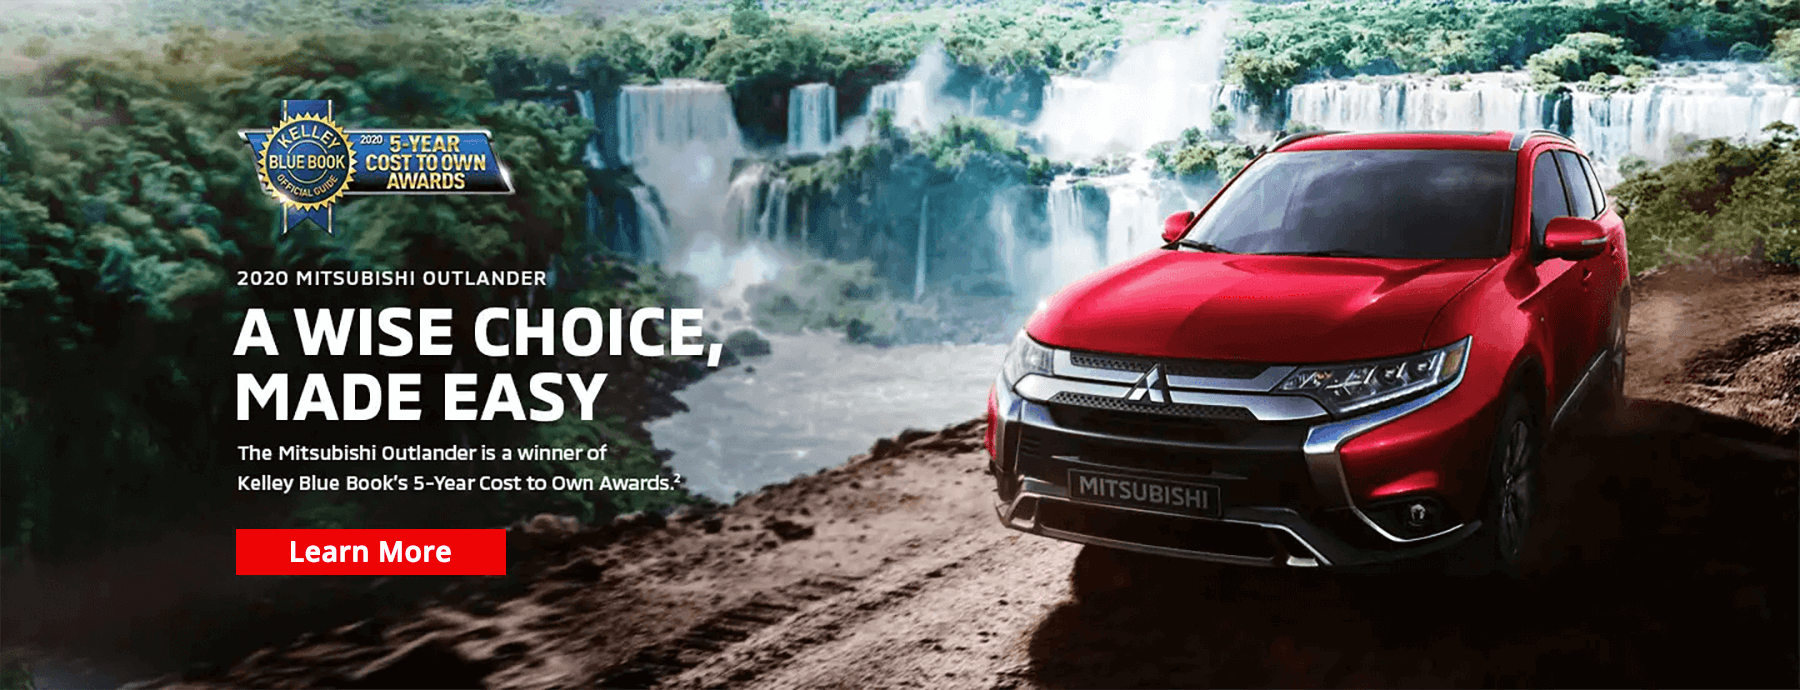 2020 Mitsubishi Outlander Kelley Blue Book 5-Year Cost to Own Award Slide